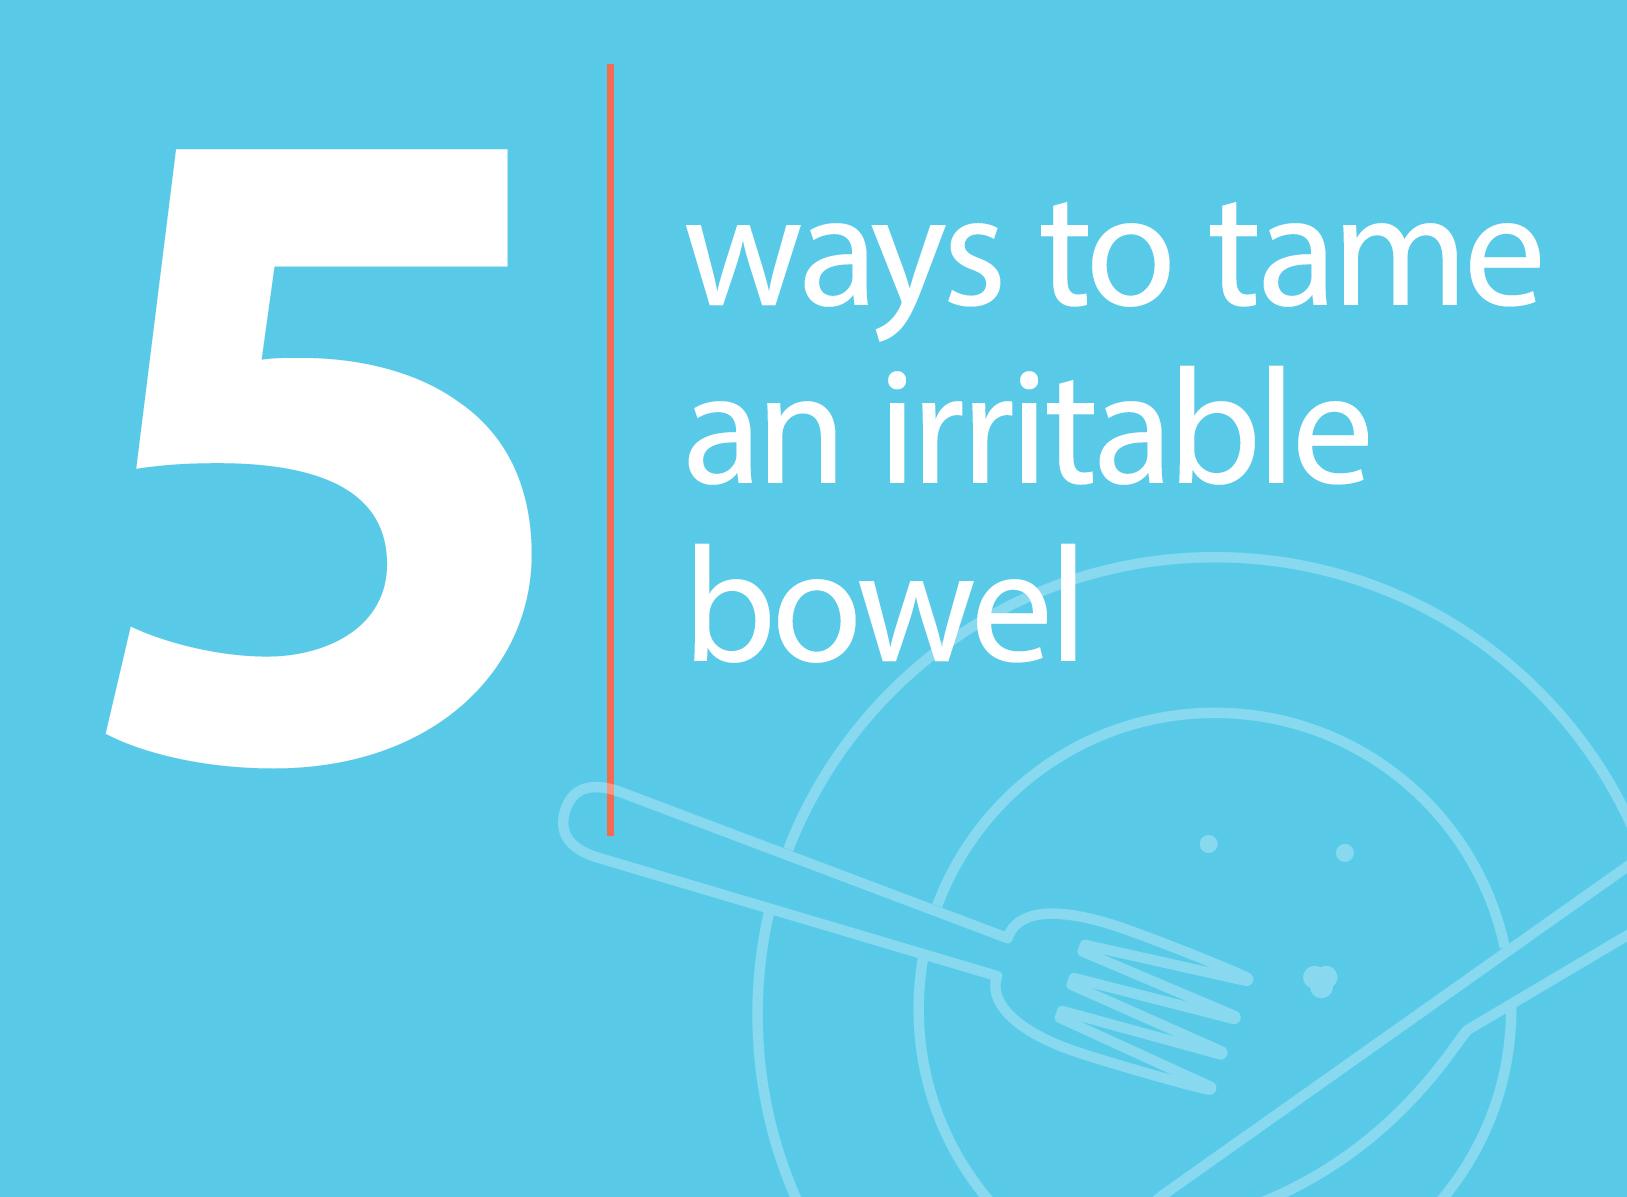 5 Ways to Tame an Irritable Bowel